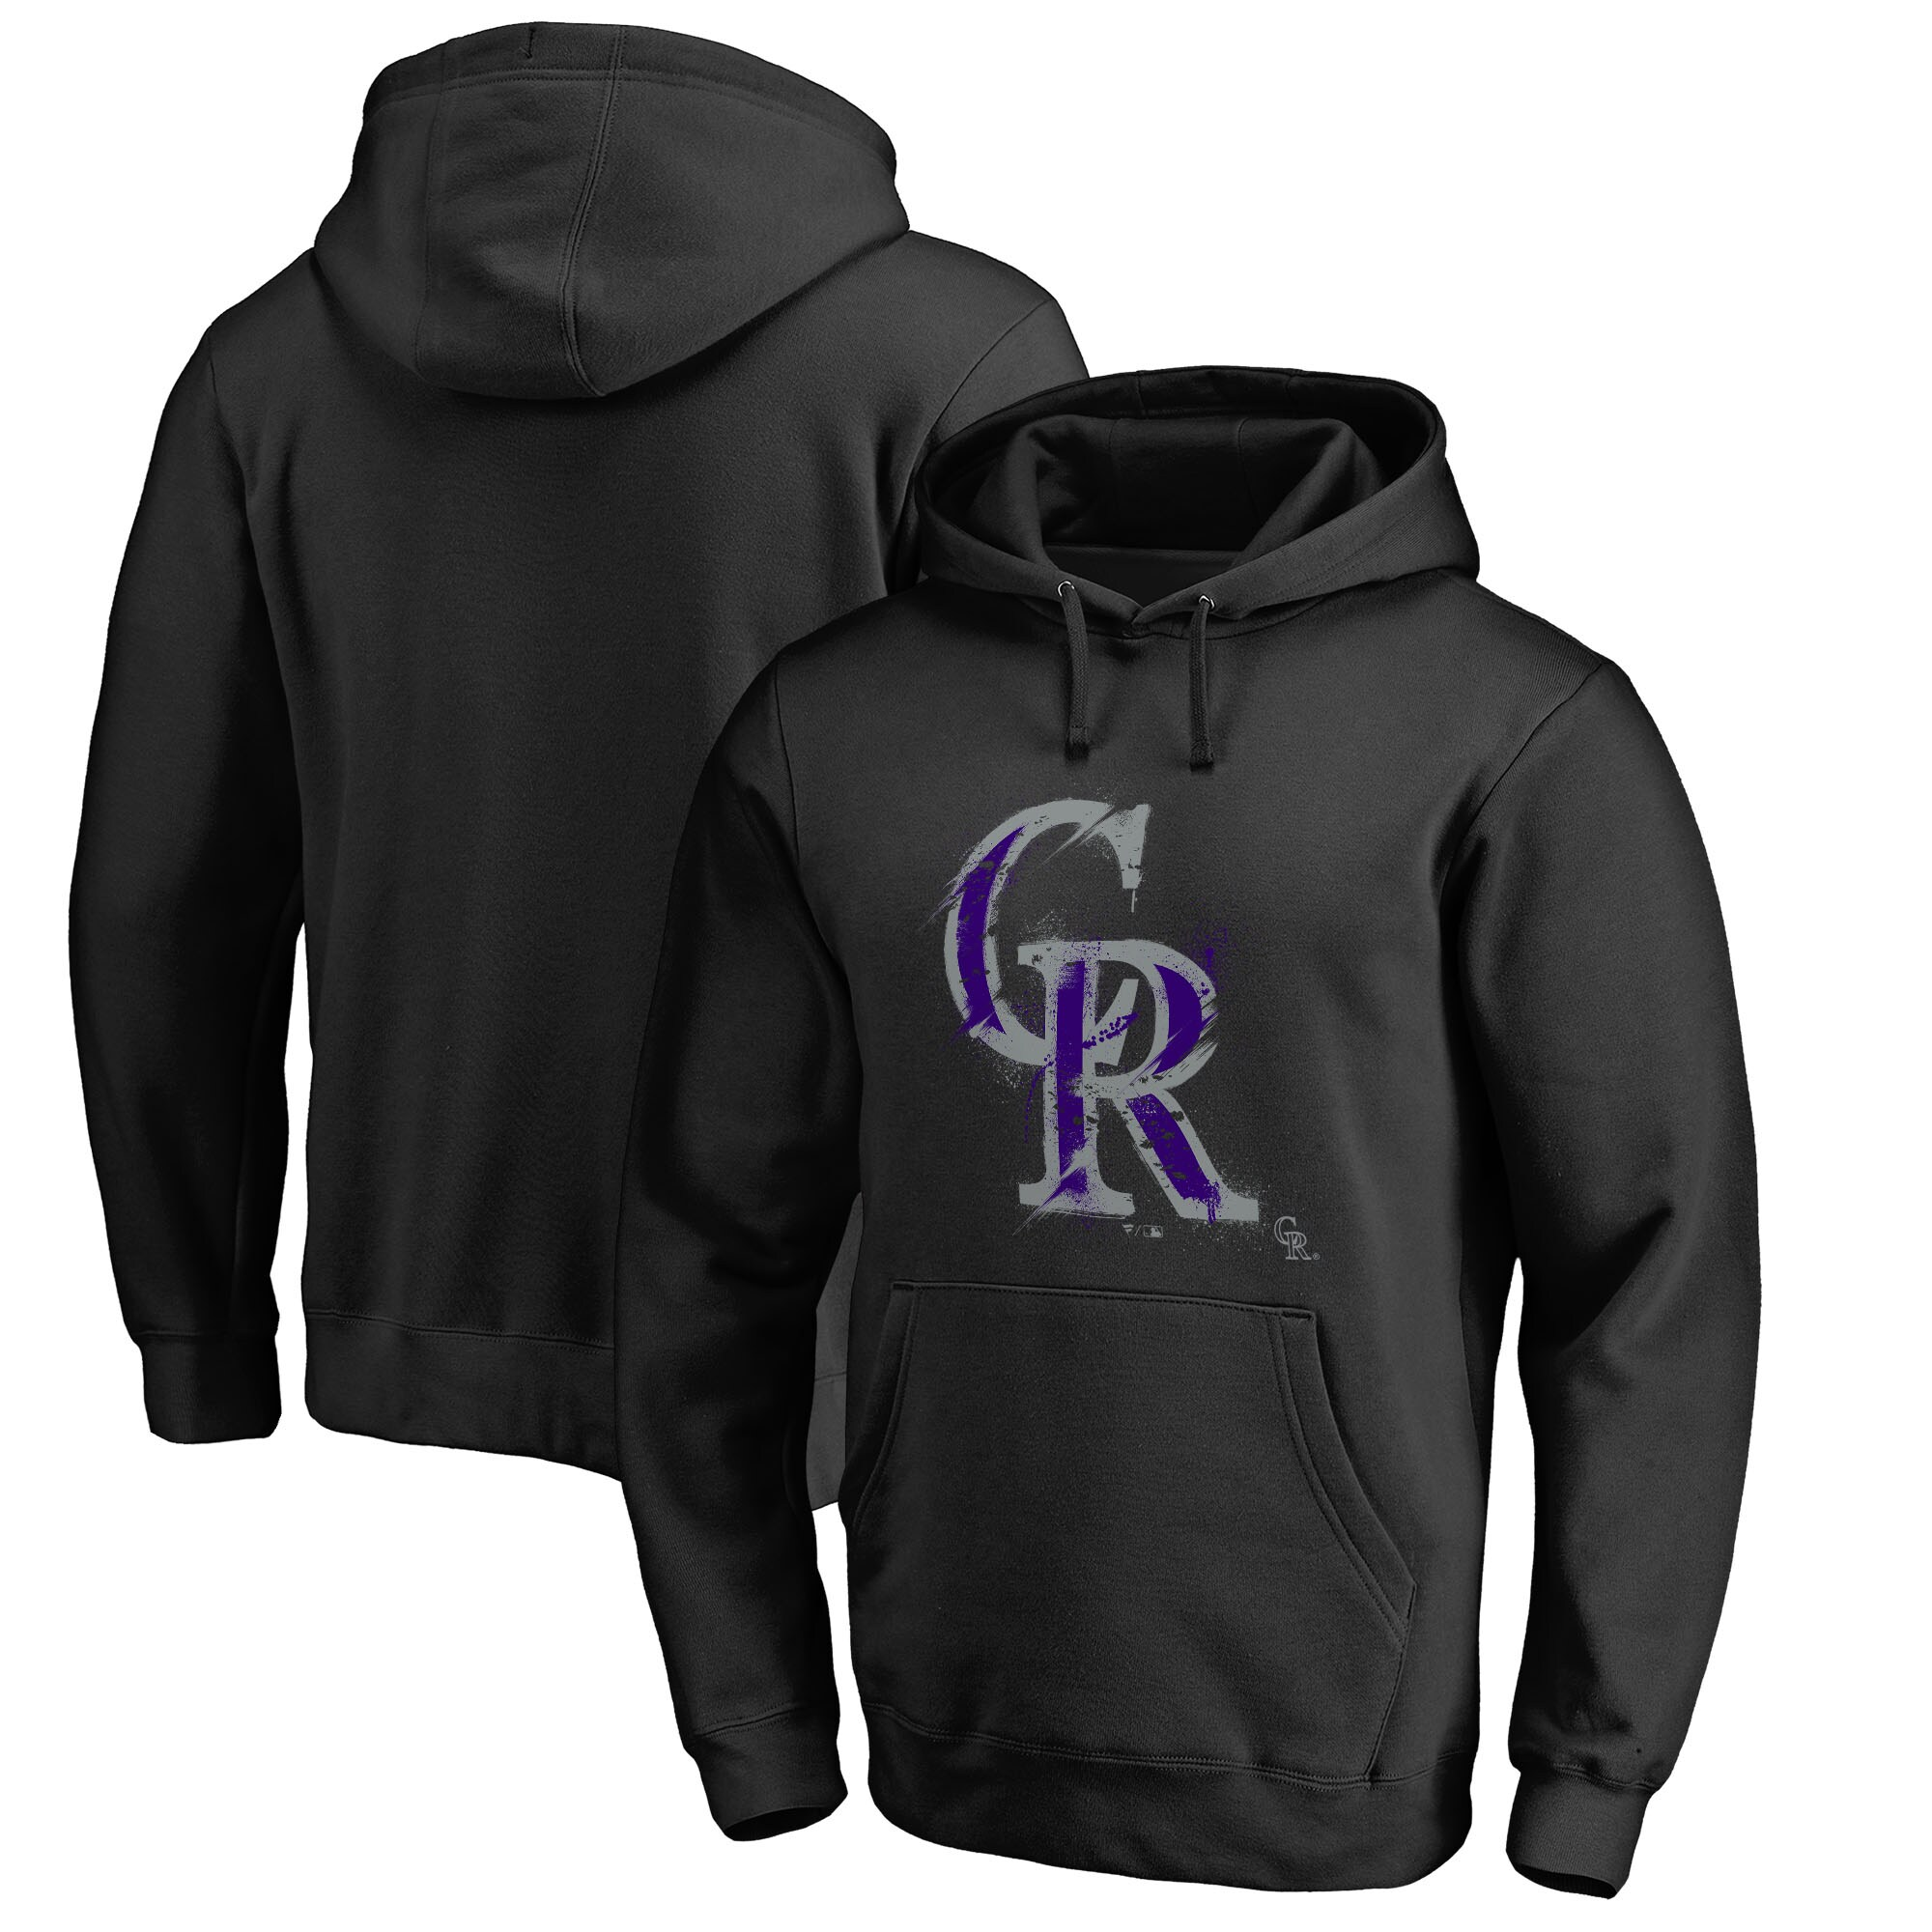 Colorado Rockies Fanatics Branded Splatter Logo Pullover Hoodie - Black